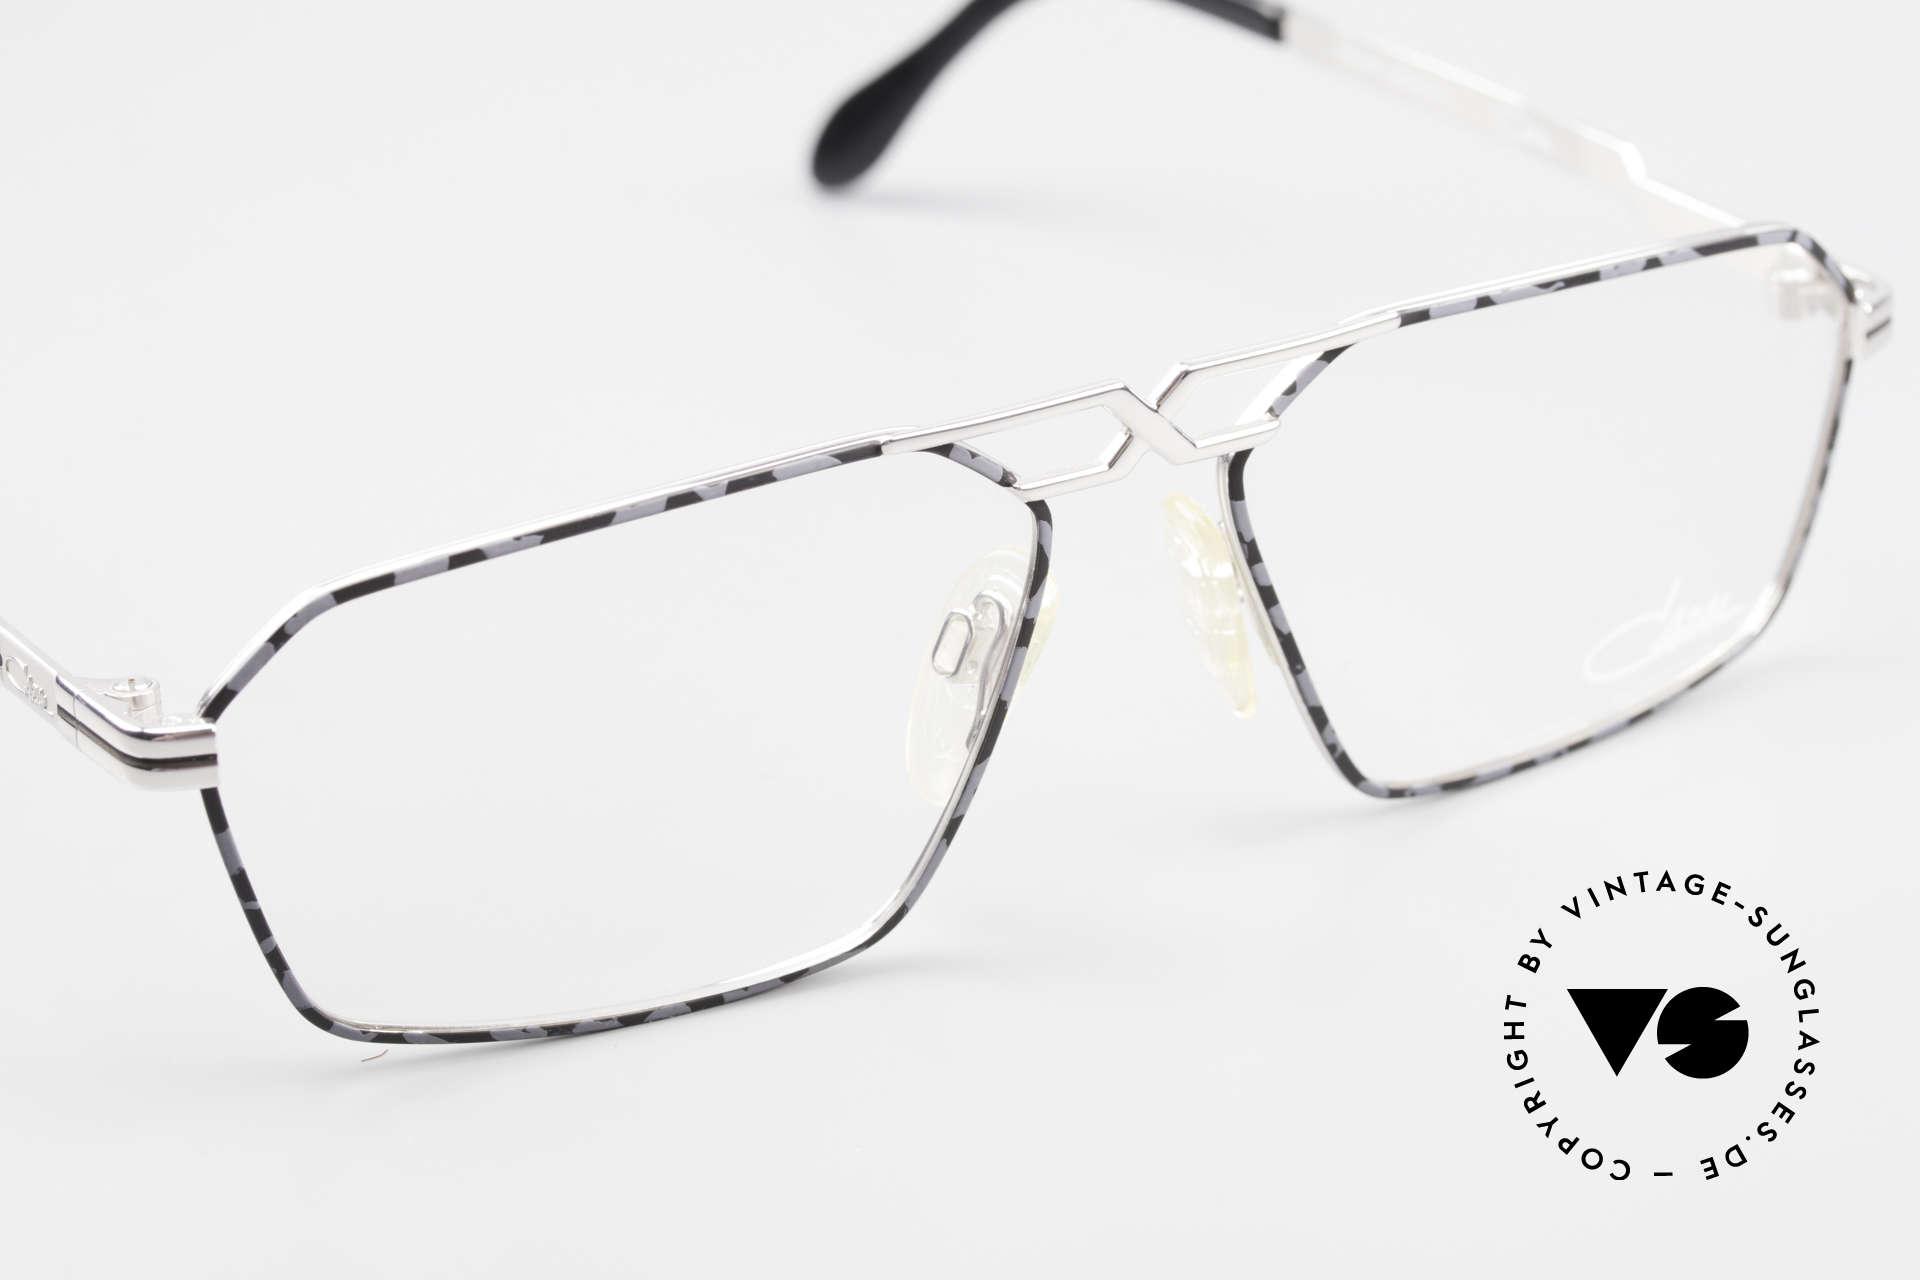 Cazal 744 90's Vintage Glasses For Men, NO retro eyeglasses; a rare 25 years old original, Made for Men